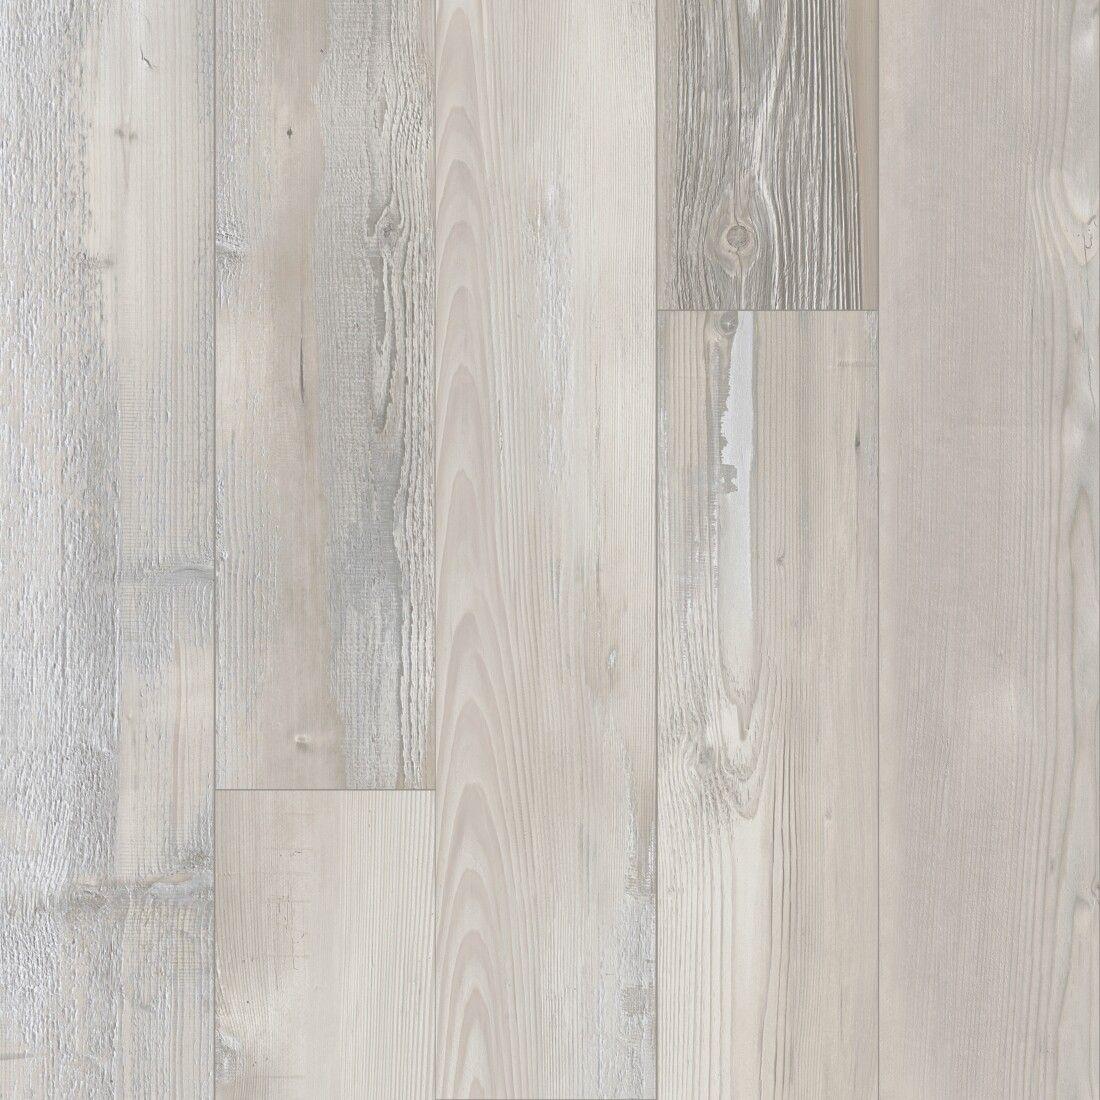 Blanched Pine Vinyl Flooring Luxury Vinyl Flooring Pergo